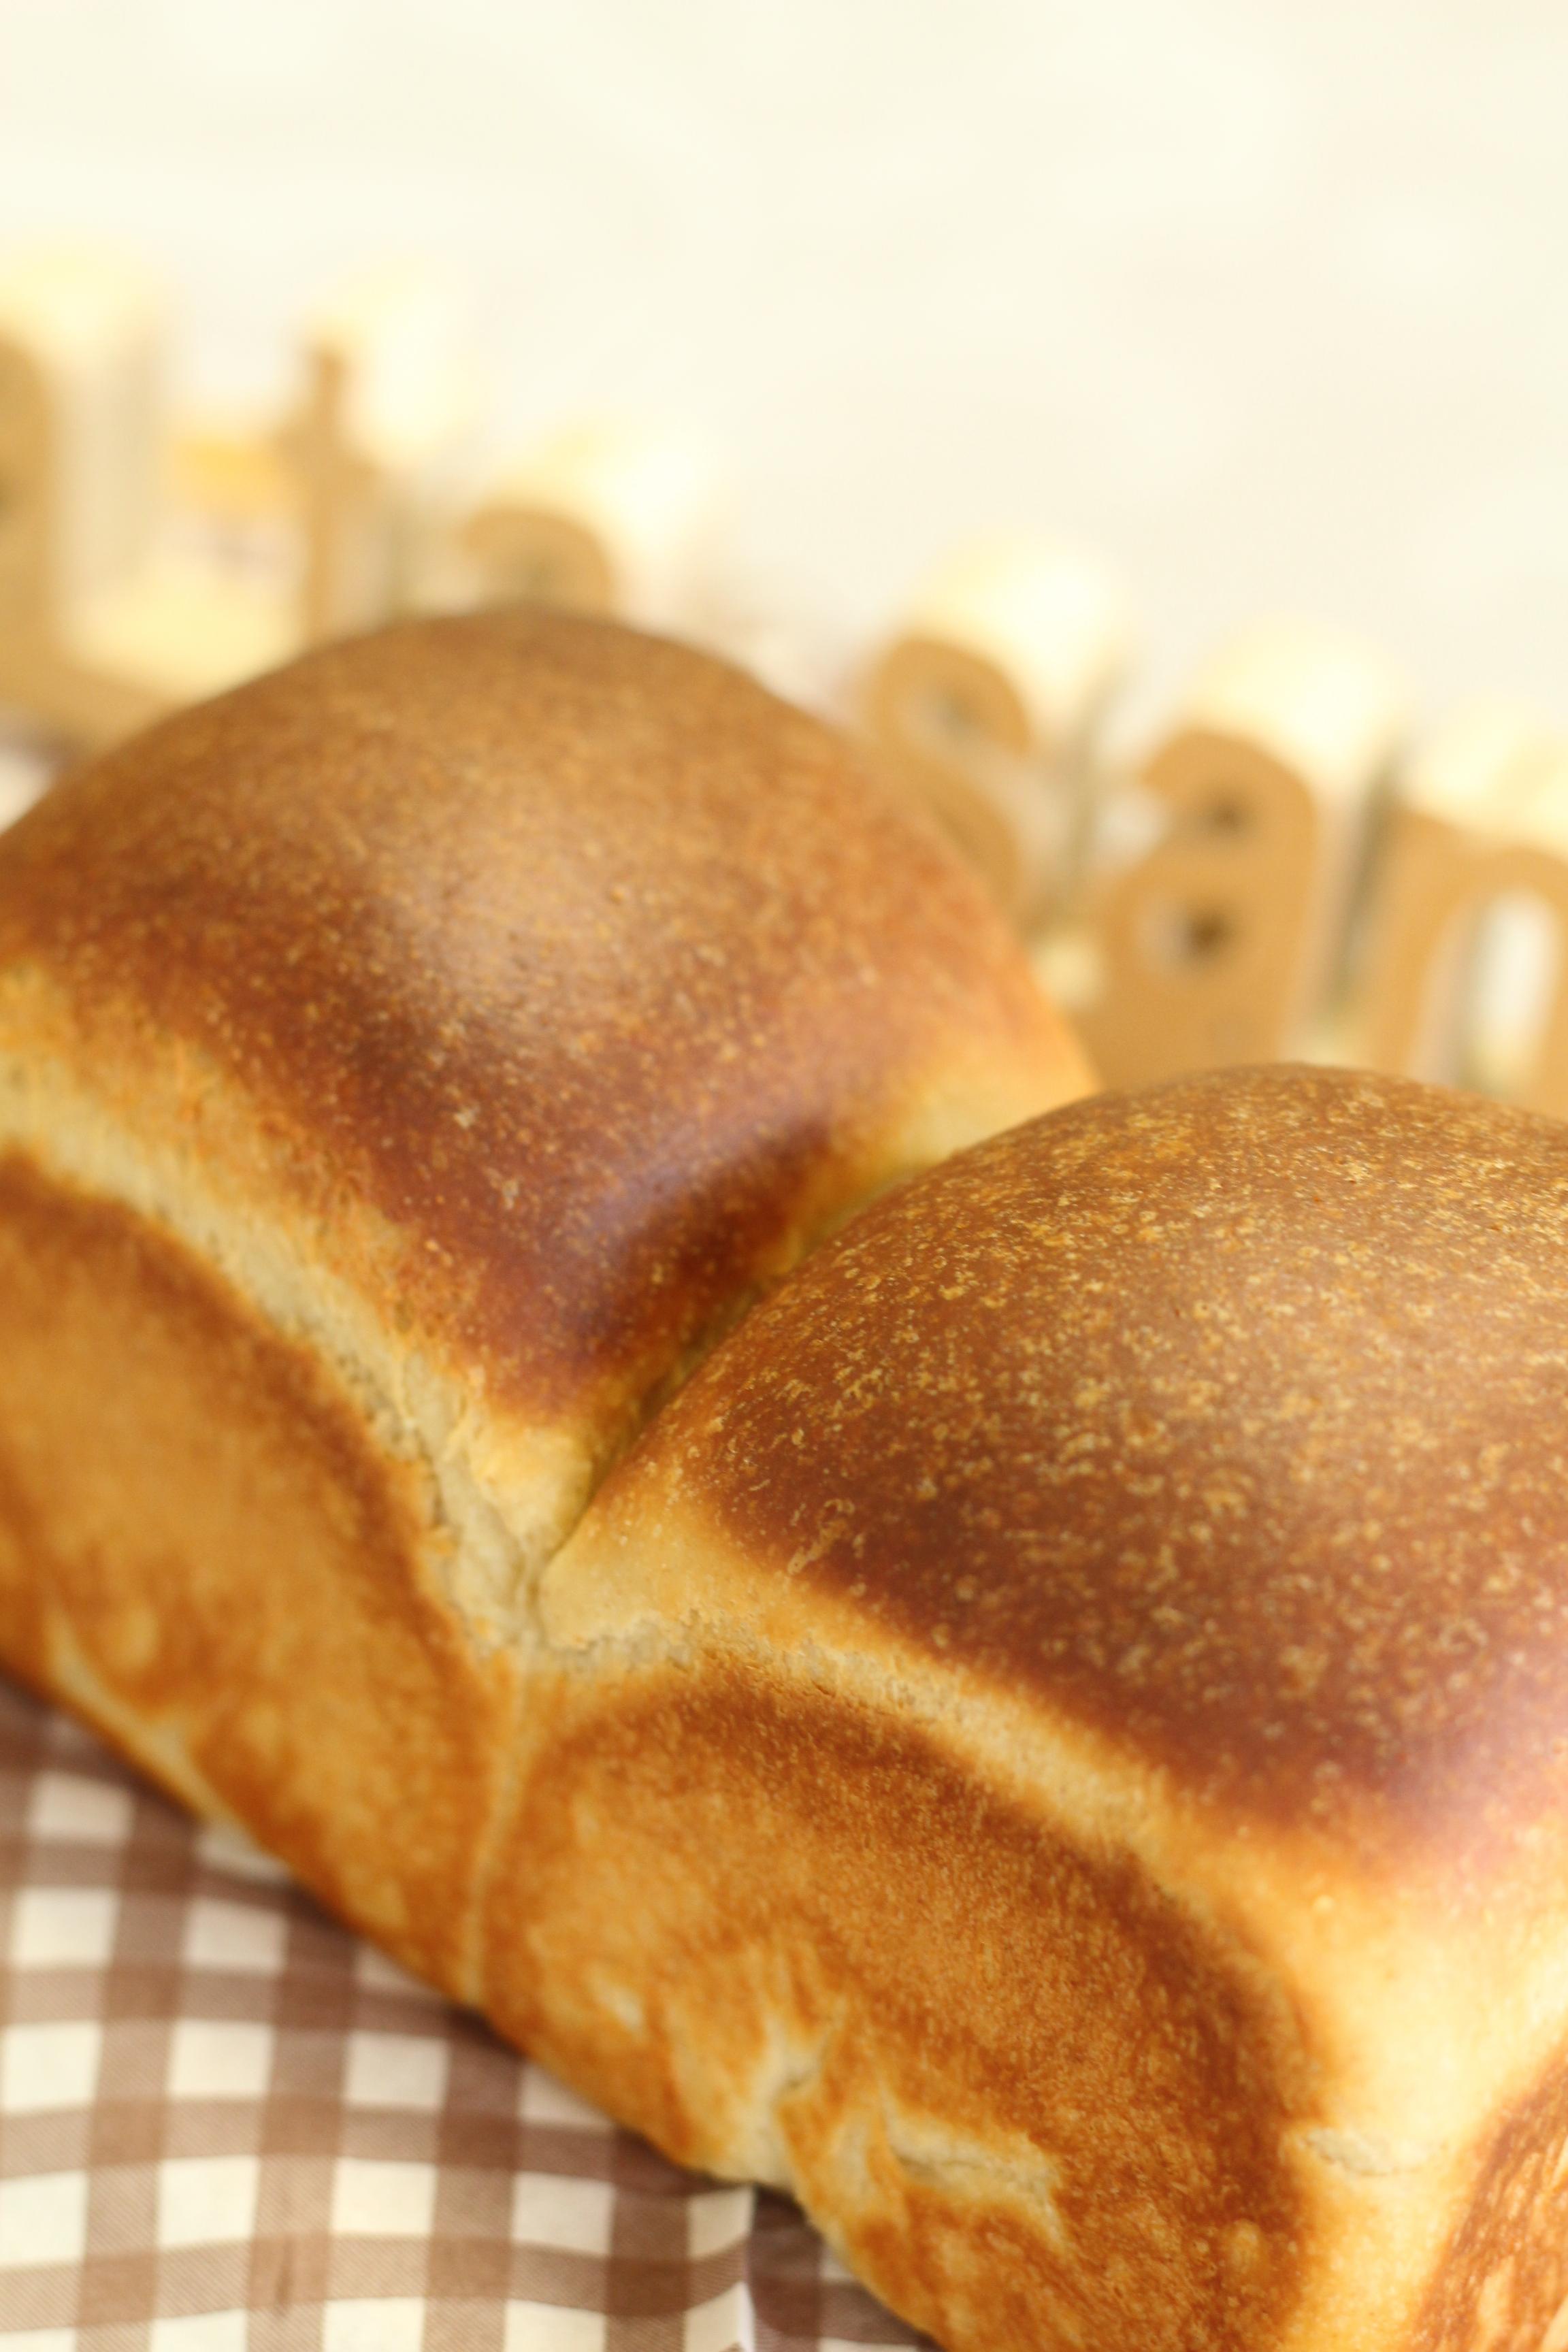 a-ta-sante.京都江部粉・糖質制限山食の試作。糖質制限パン・料理教室、阿倍野区西田辺